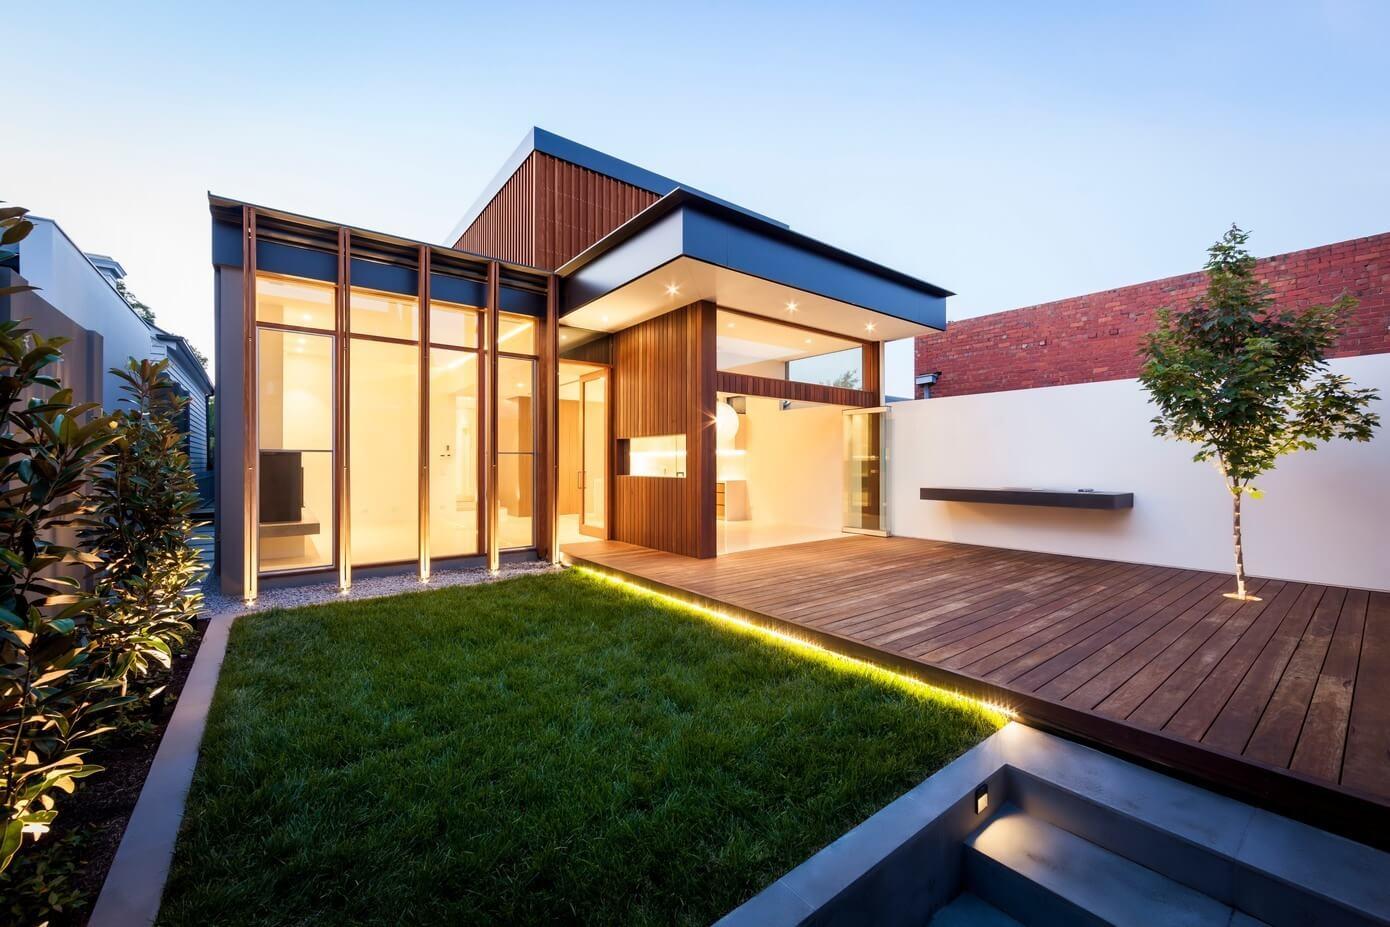 armadale-house-mitsuori-architects-13